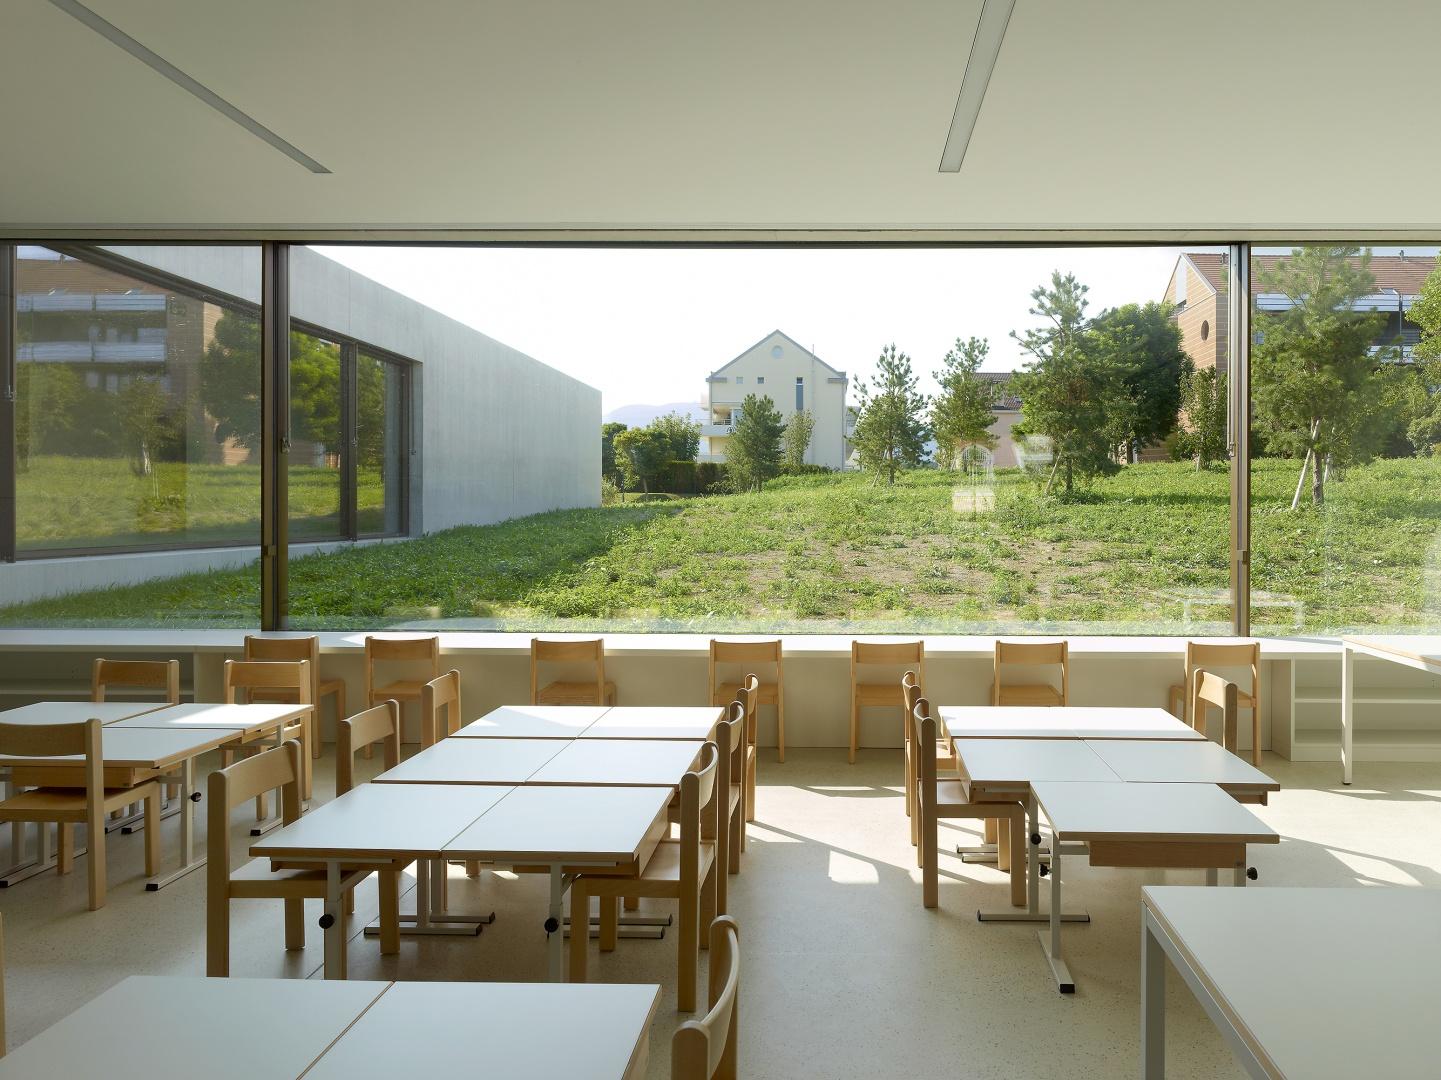 salle classe/jardin © Thomas Jantscher